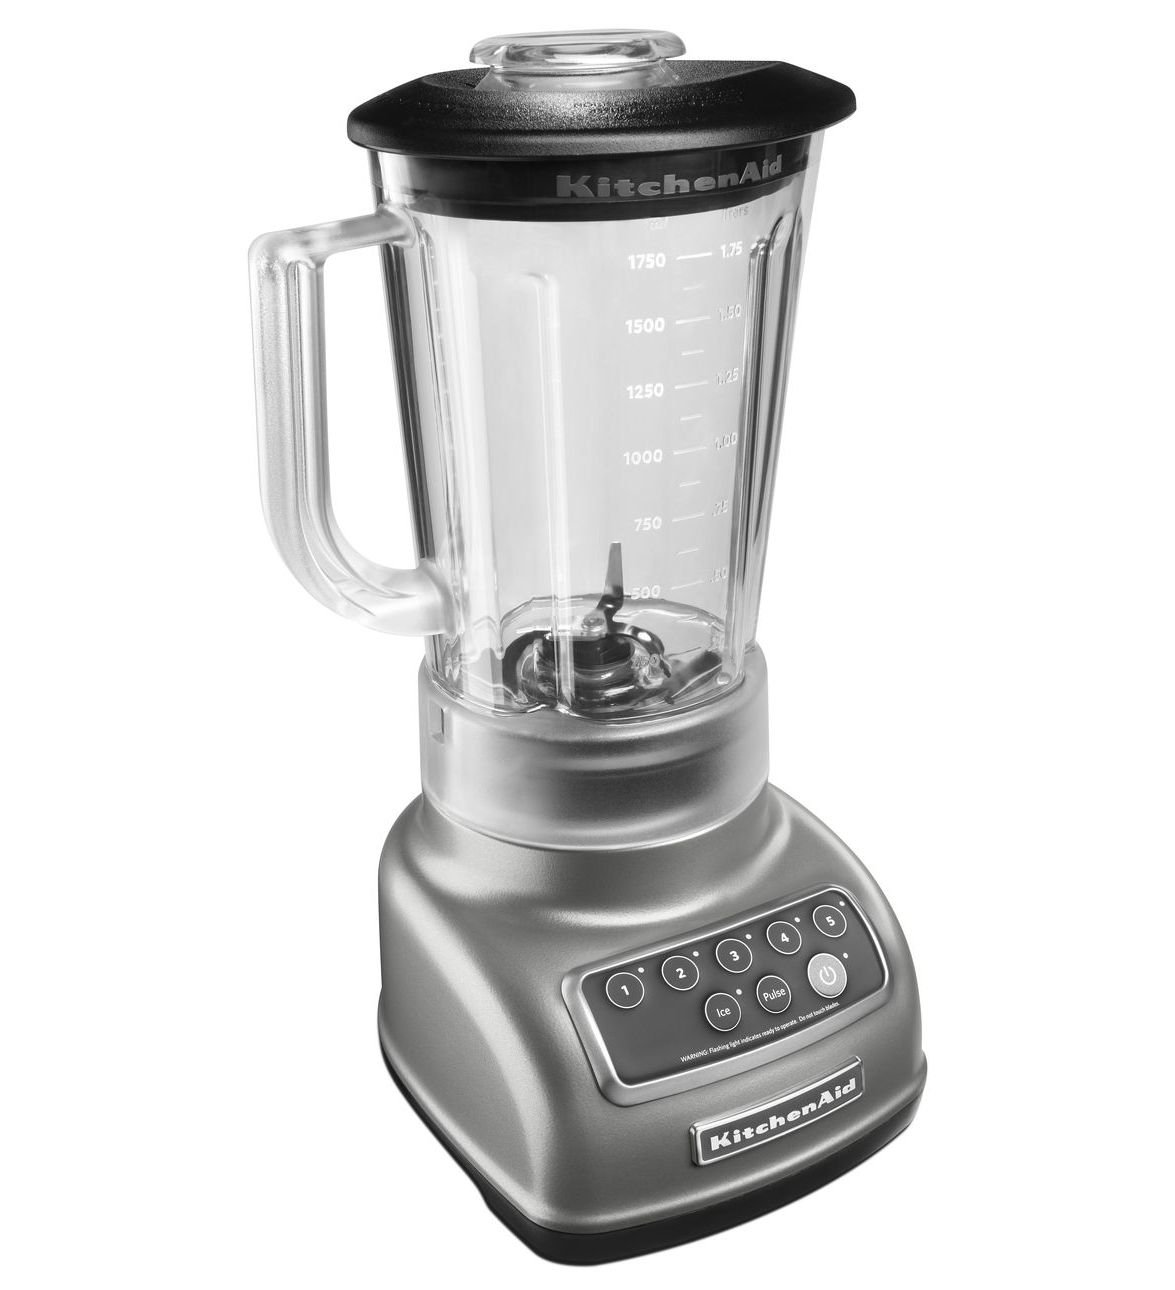 KitchenAid KSB1570SL: One Blender, All Foods